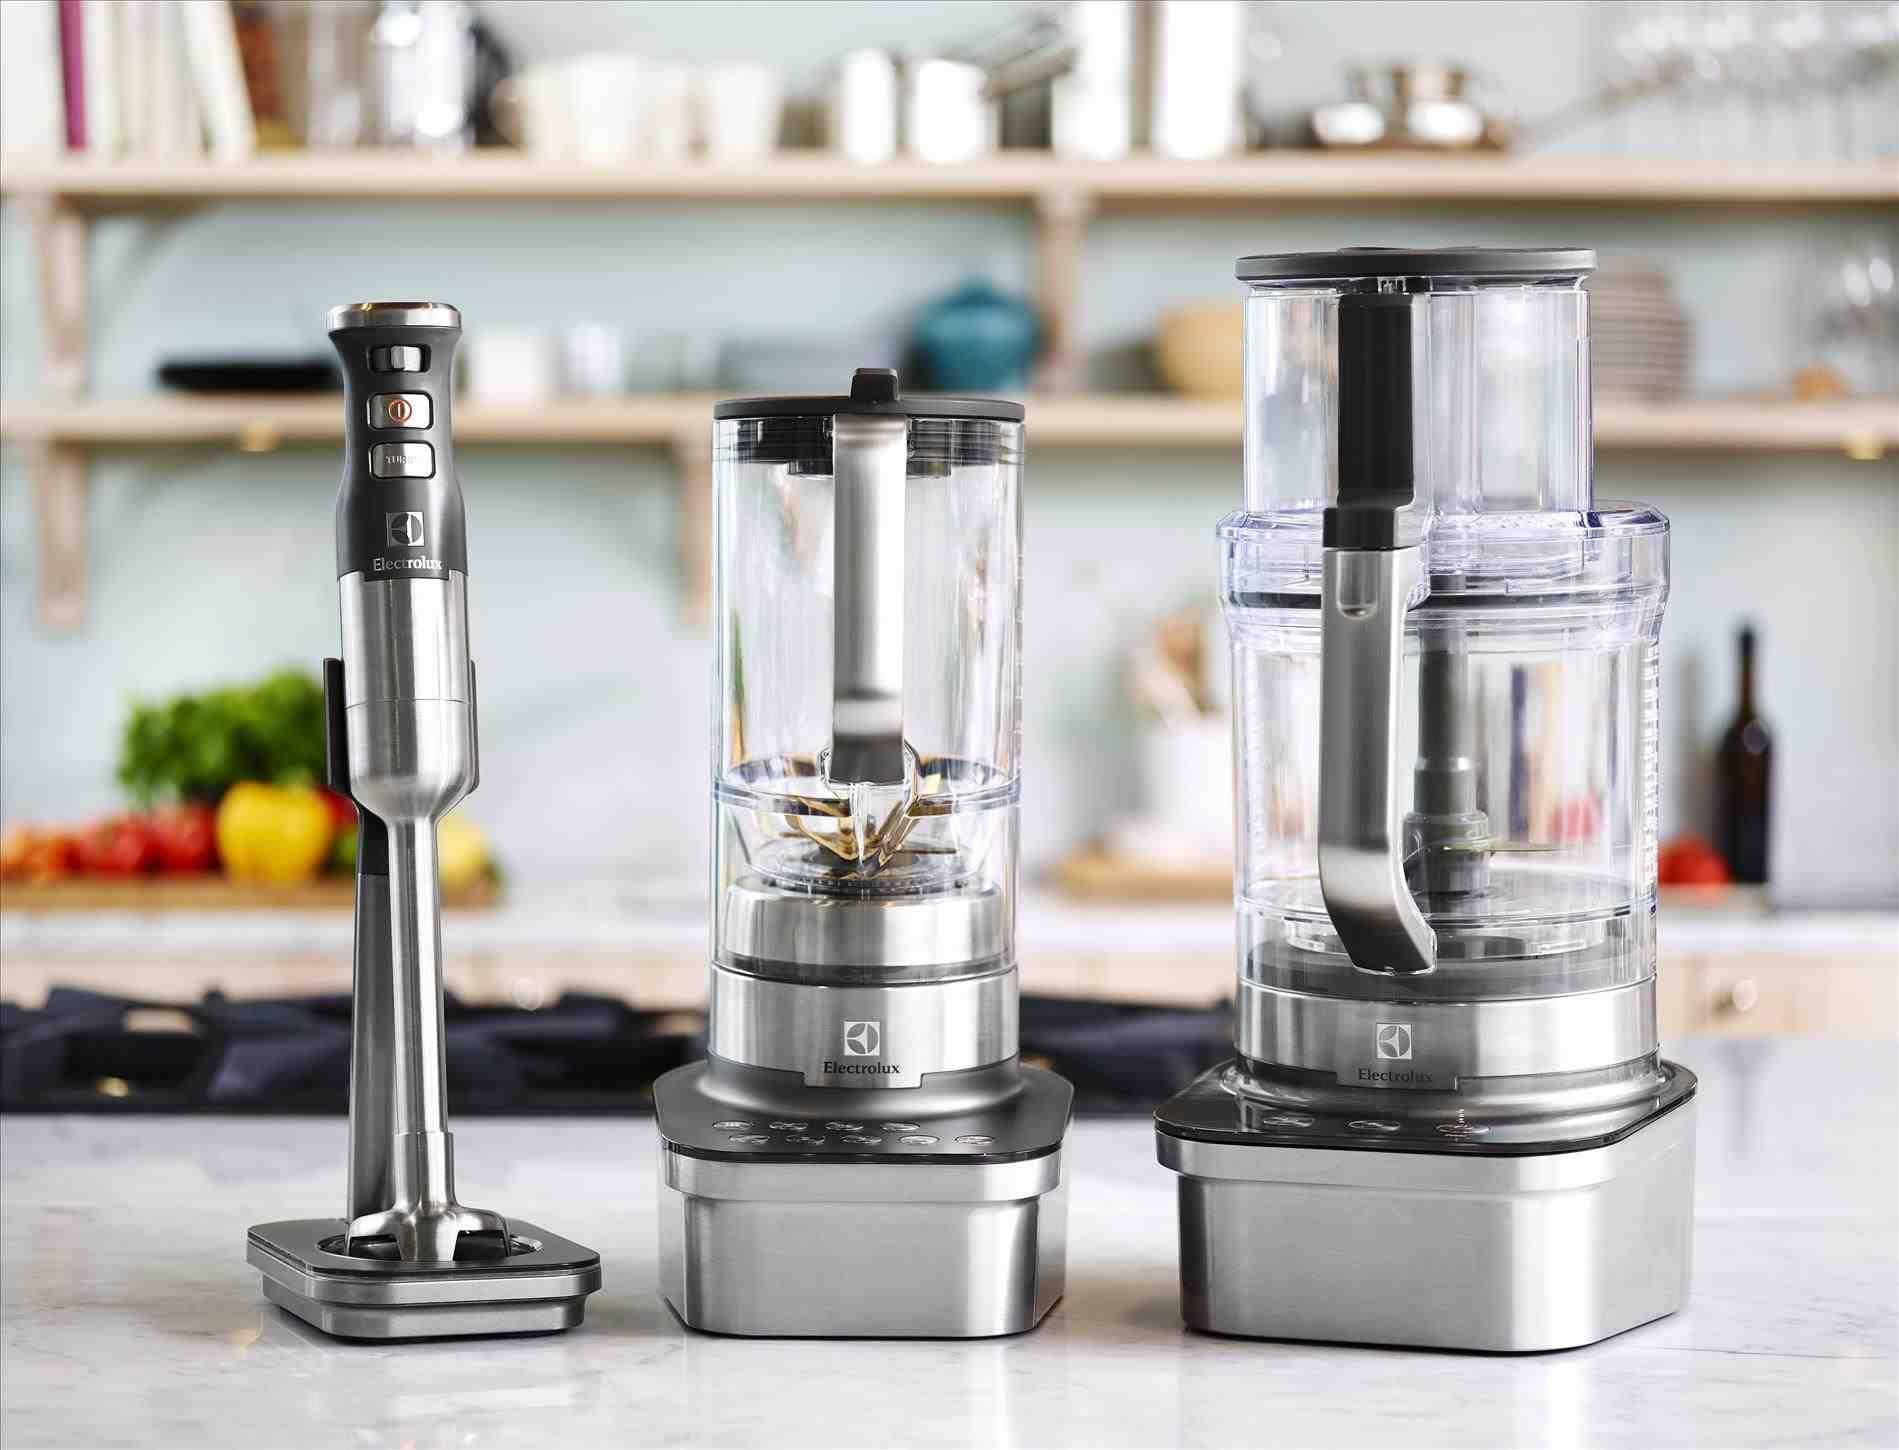 New Post top brands for kitchen appliances | Decors Ideas ...